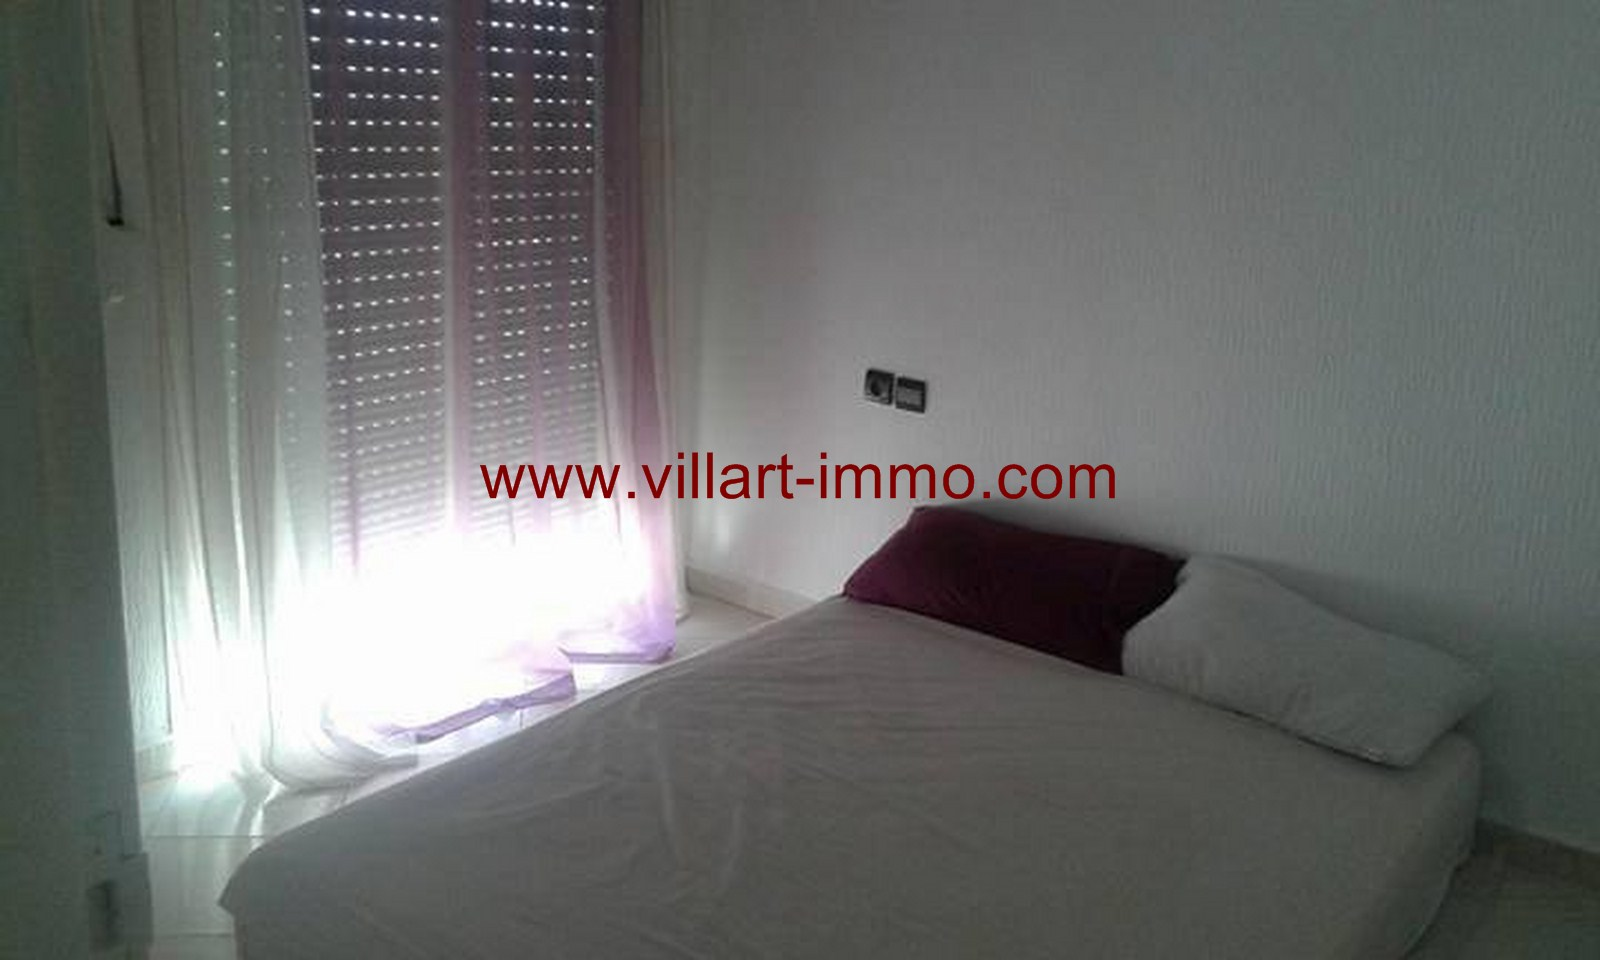 4-Vente-Appartement-Assilah-Autres-Chambre-VA62-Villart Immo